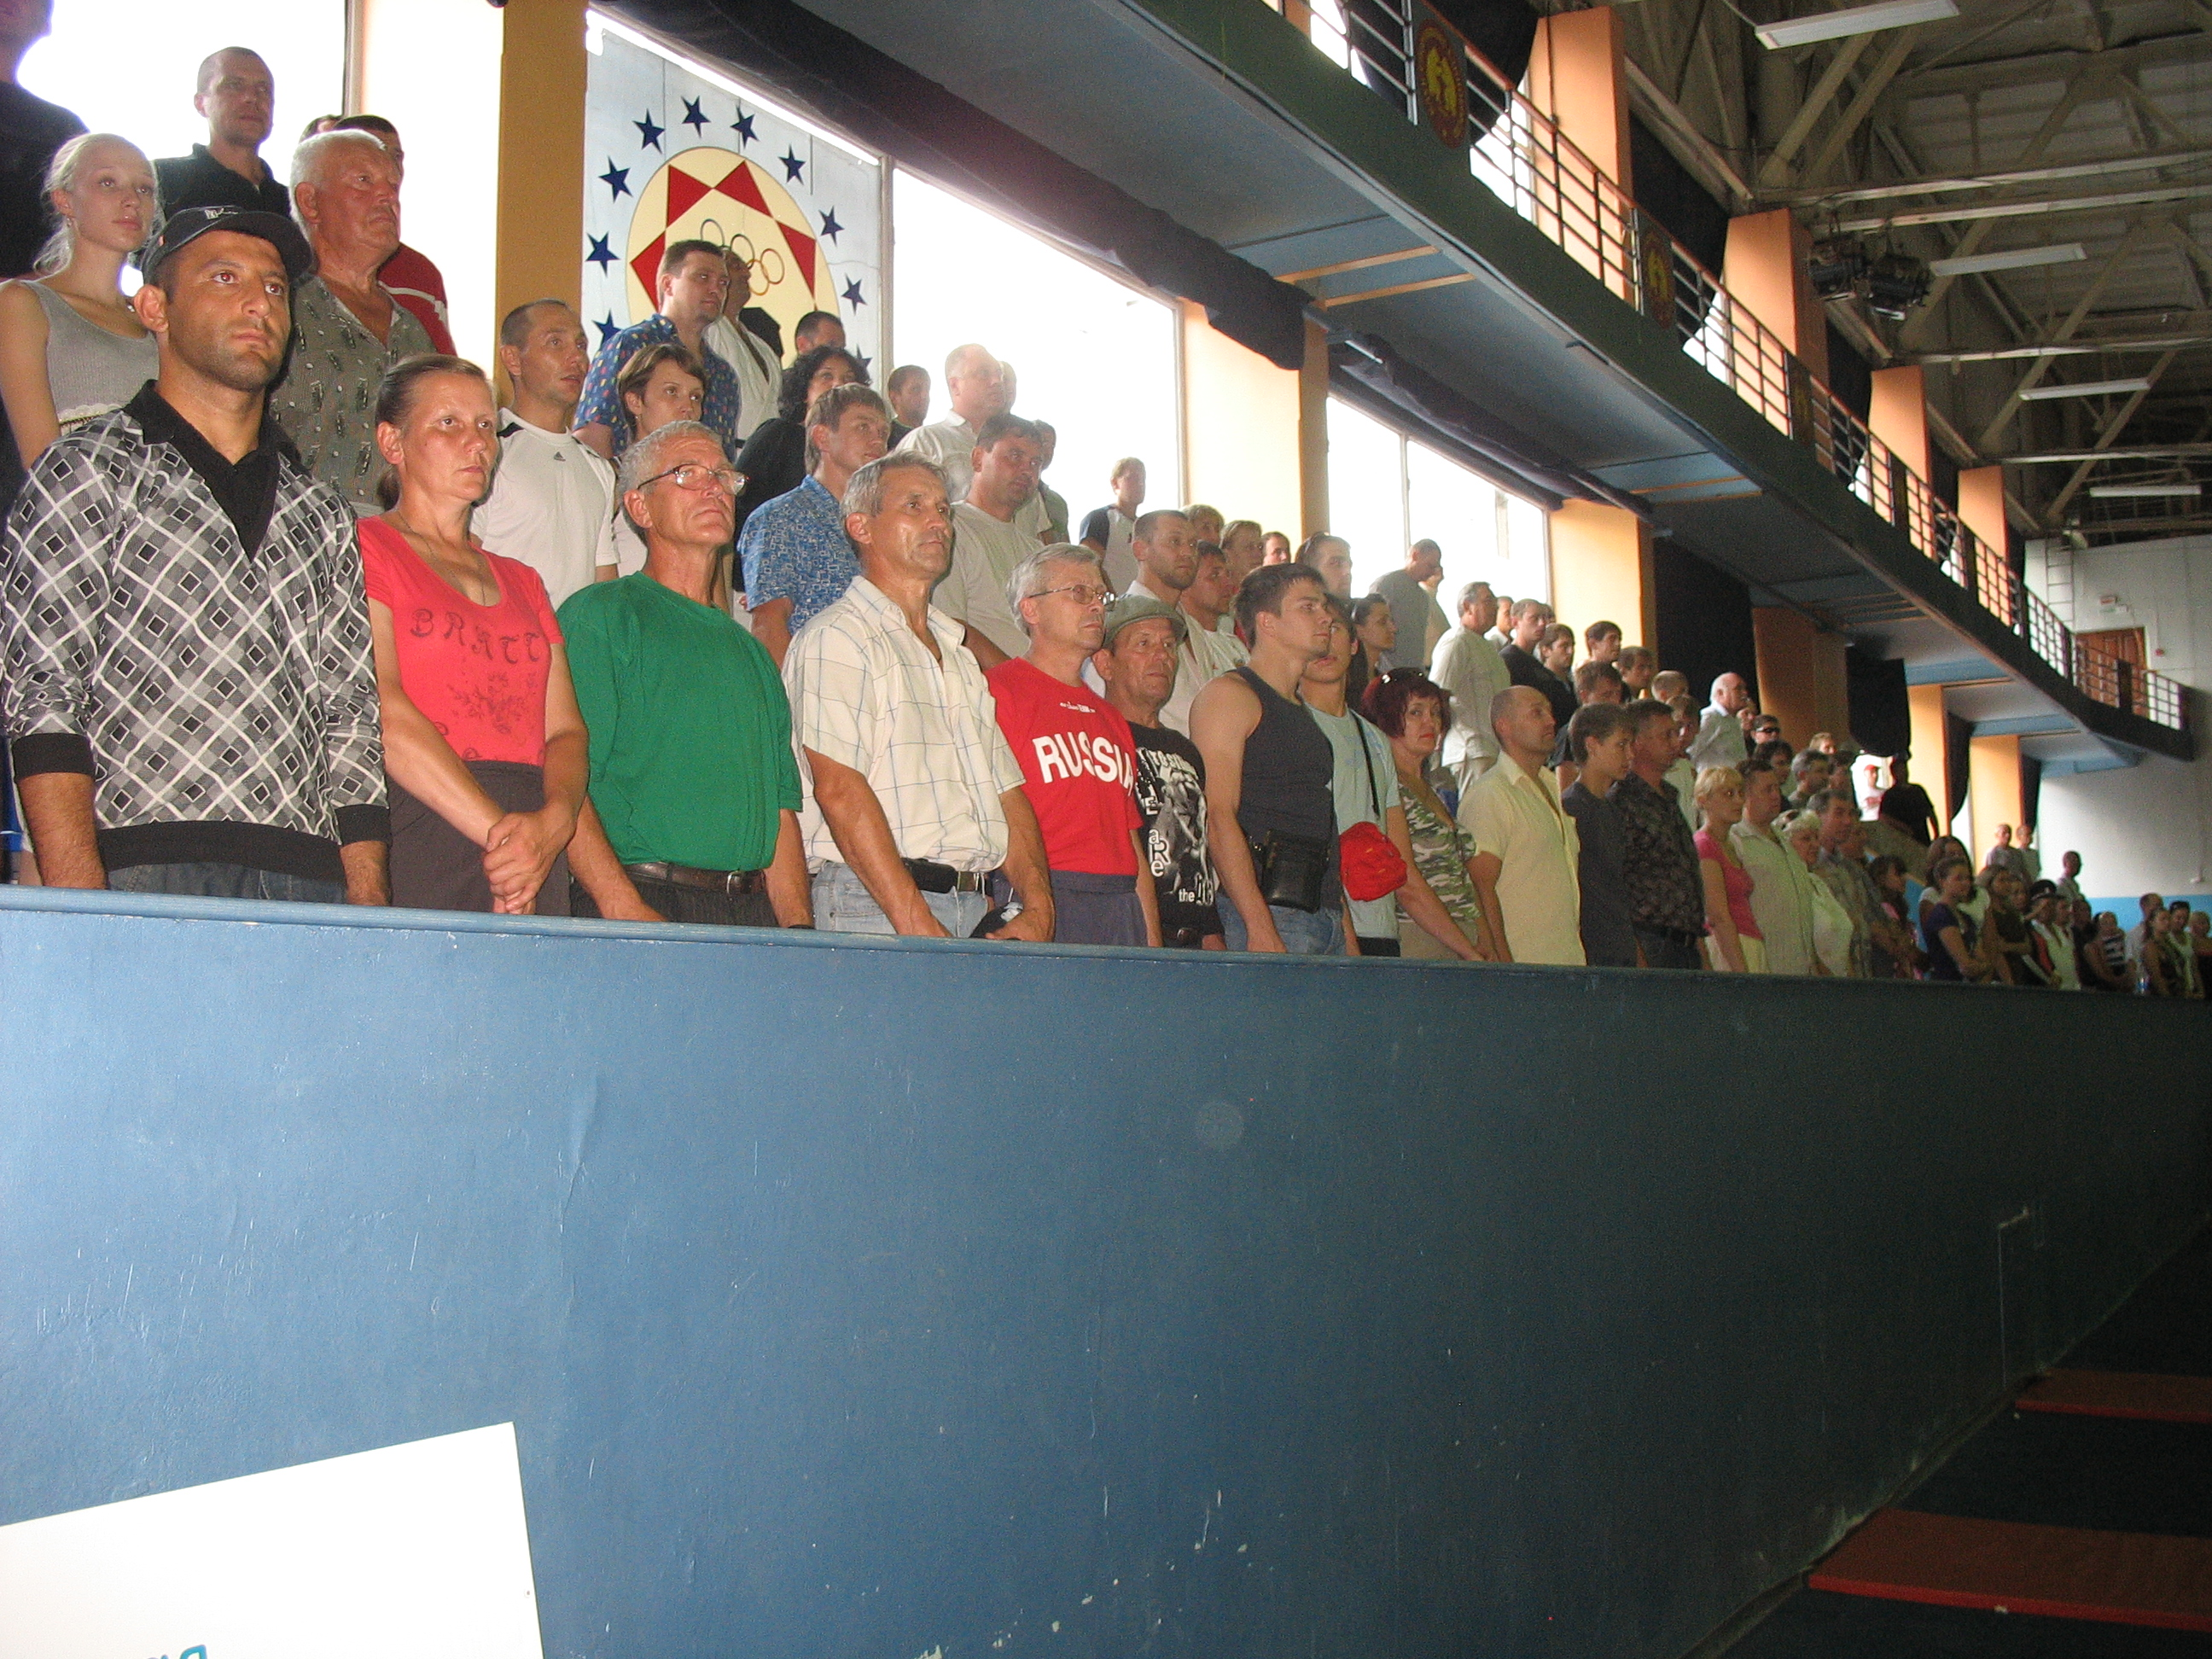 Зрители слушают гимн стоя